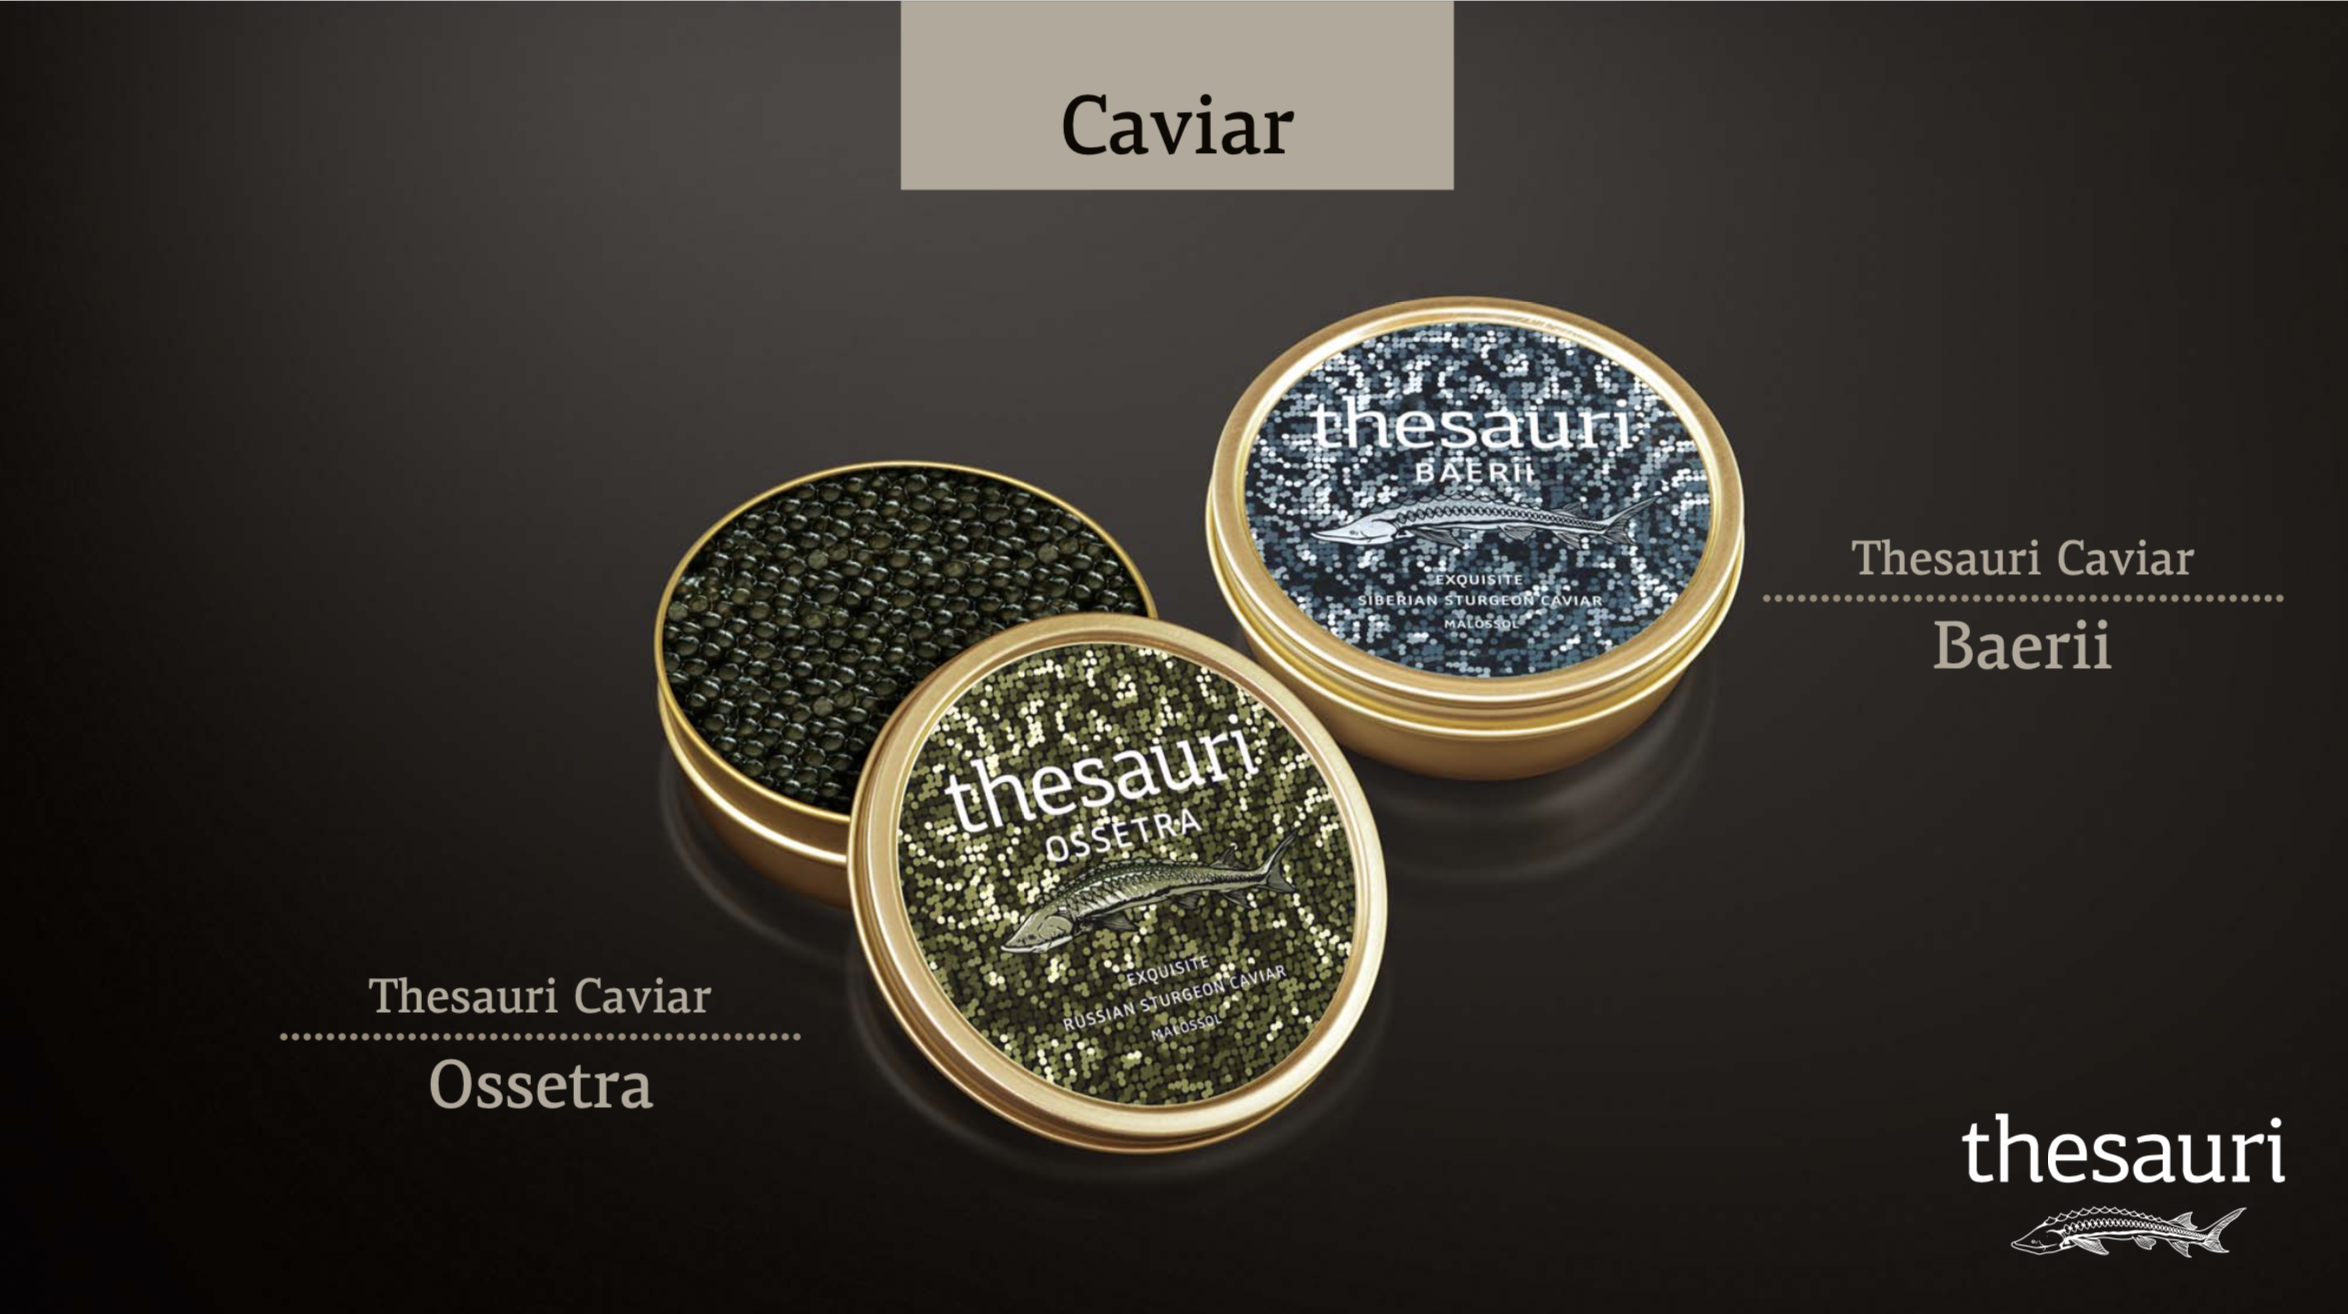 caviar_greece_greek_thesauri.png